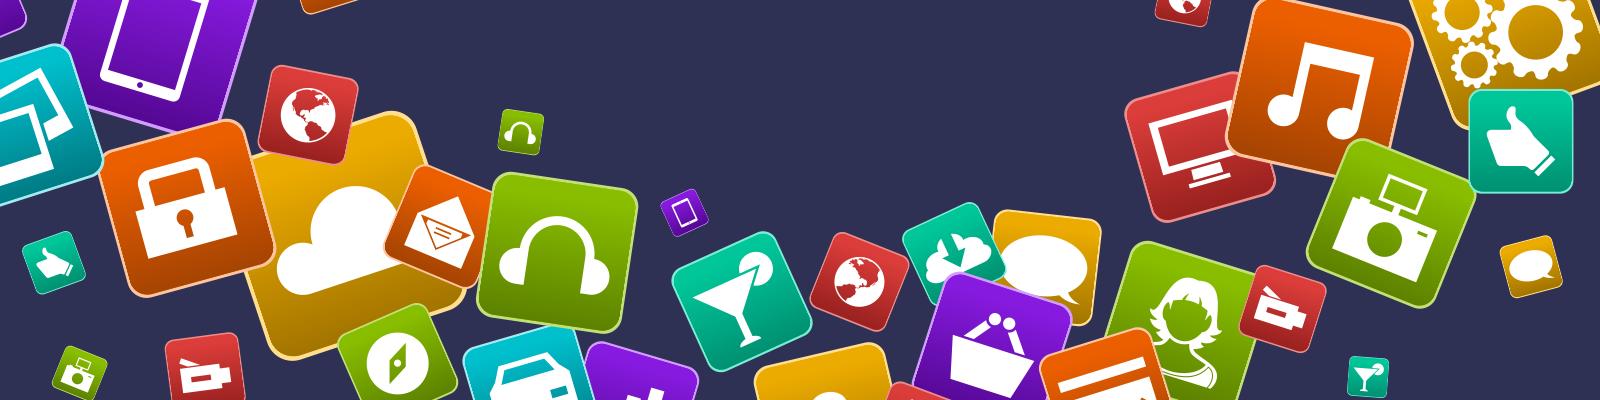 on-demand app developers